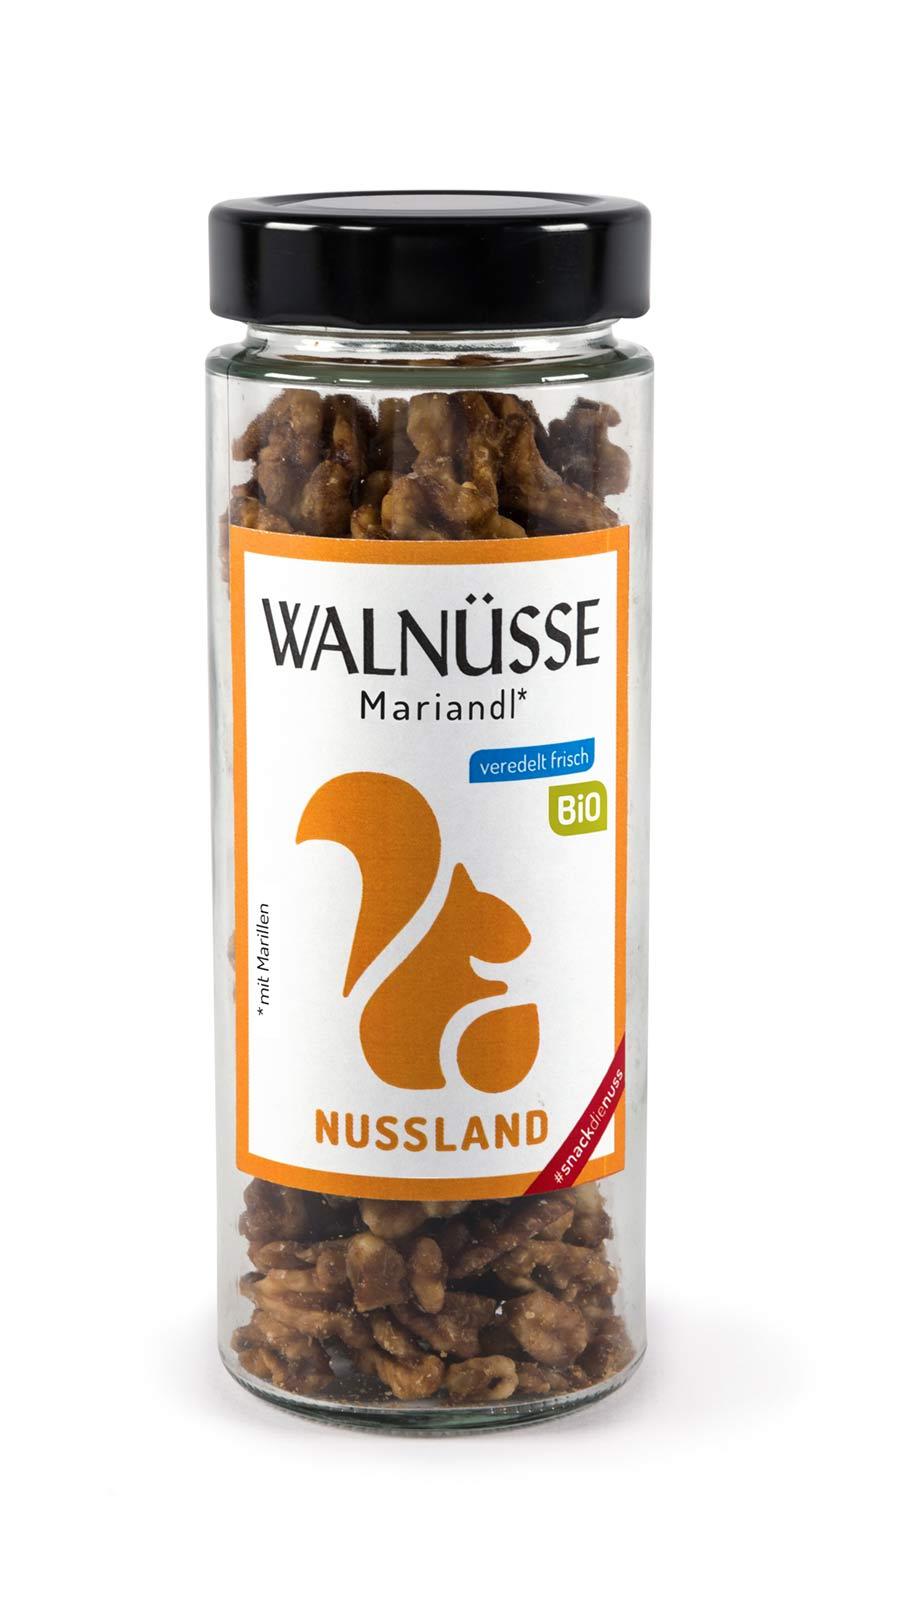 BIO Walnuss-Snack 'Mariandl'